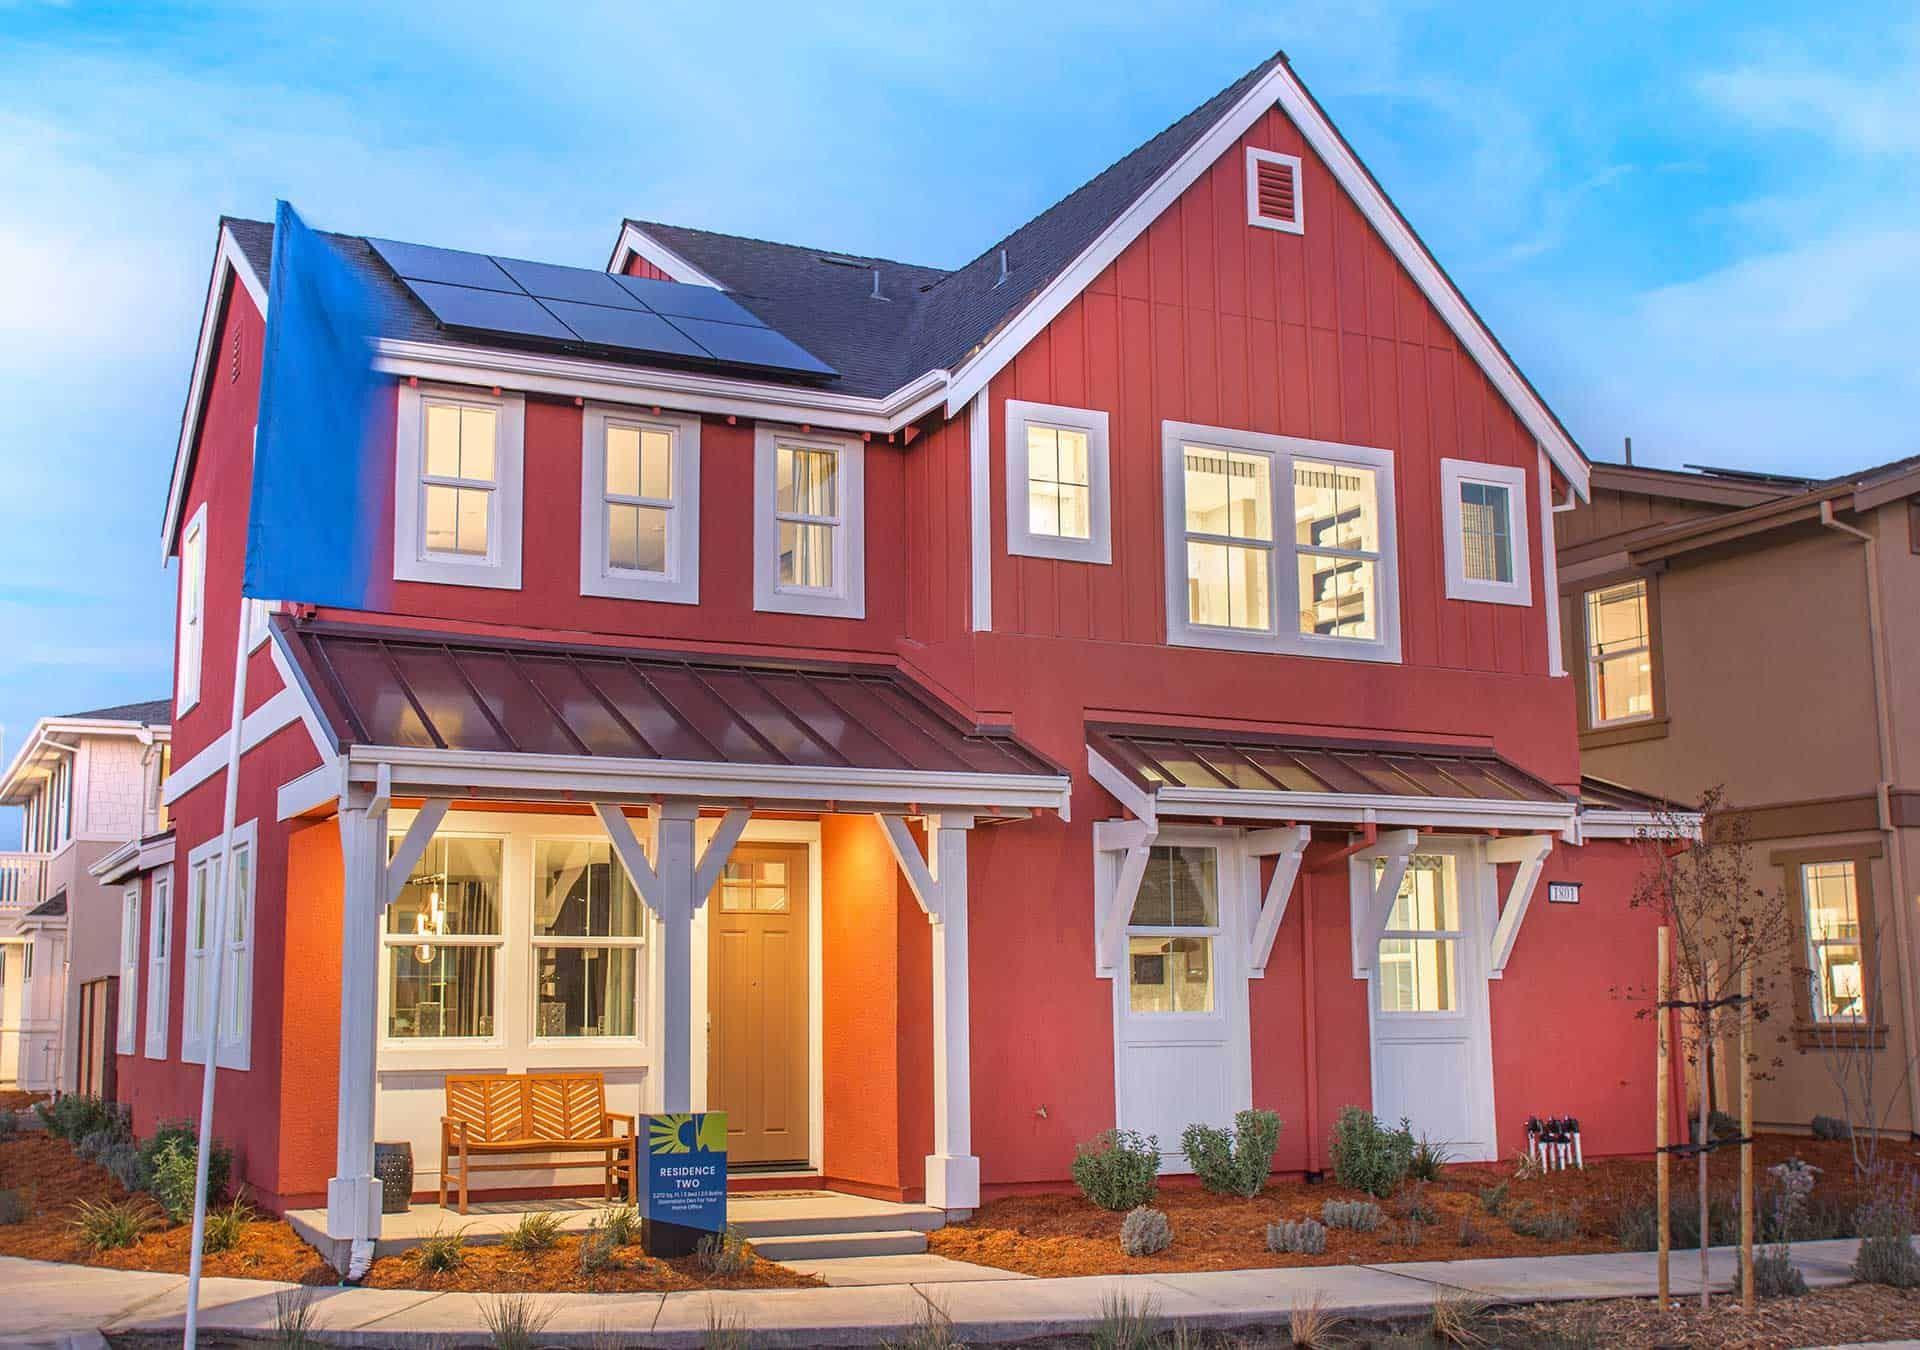 'Riverfront' by Tri Pointe Homes Bay Area in Santa Rosa